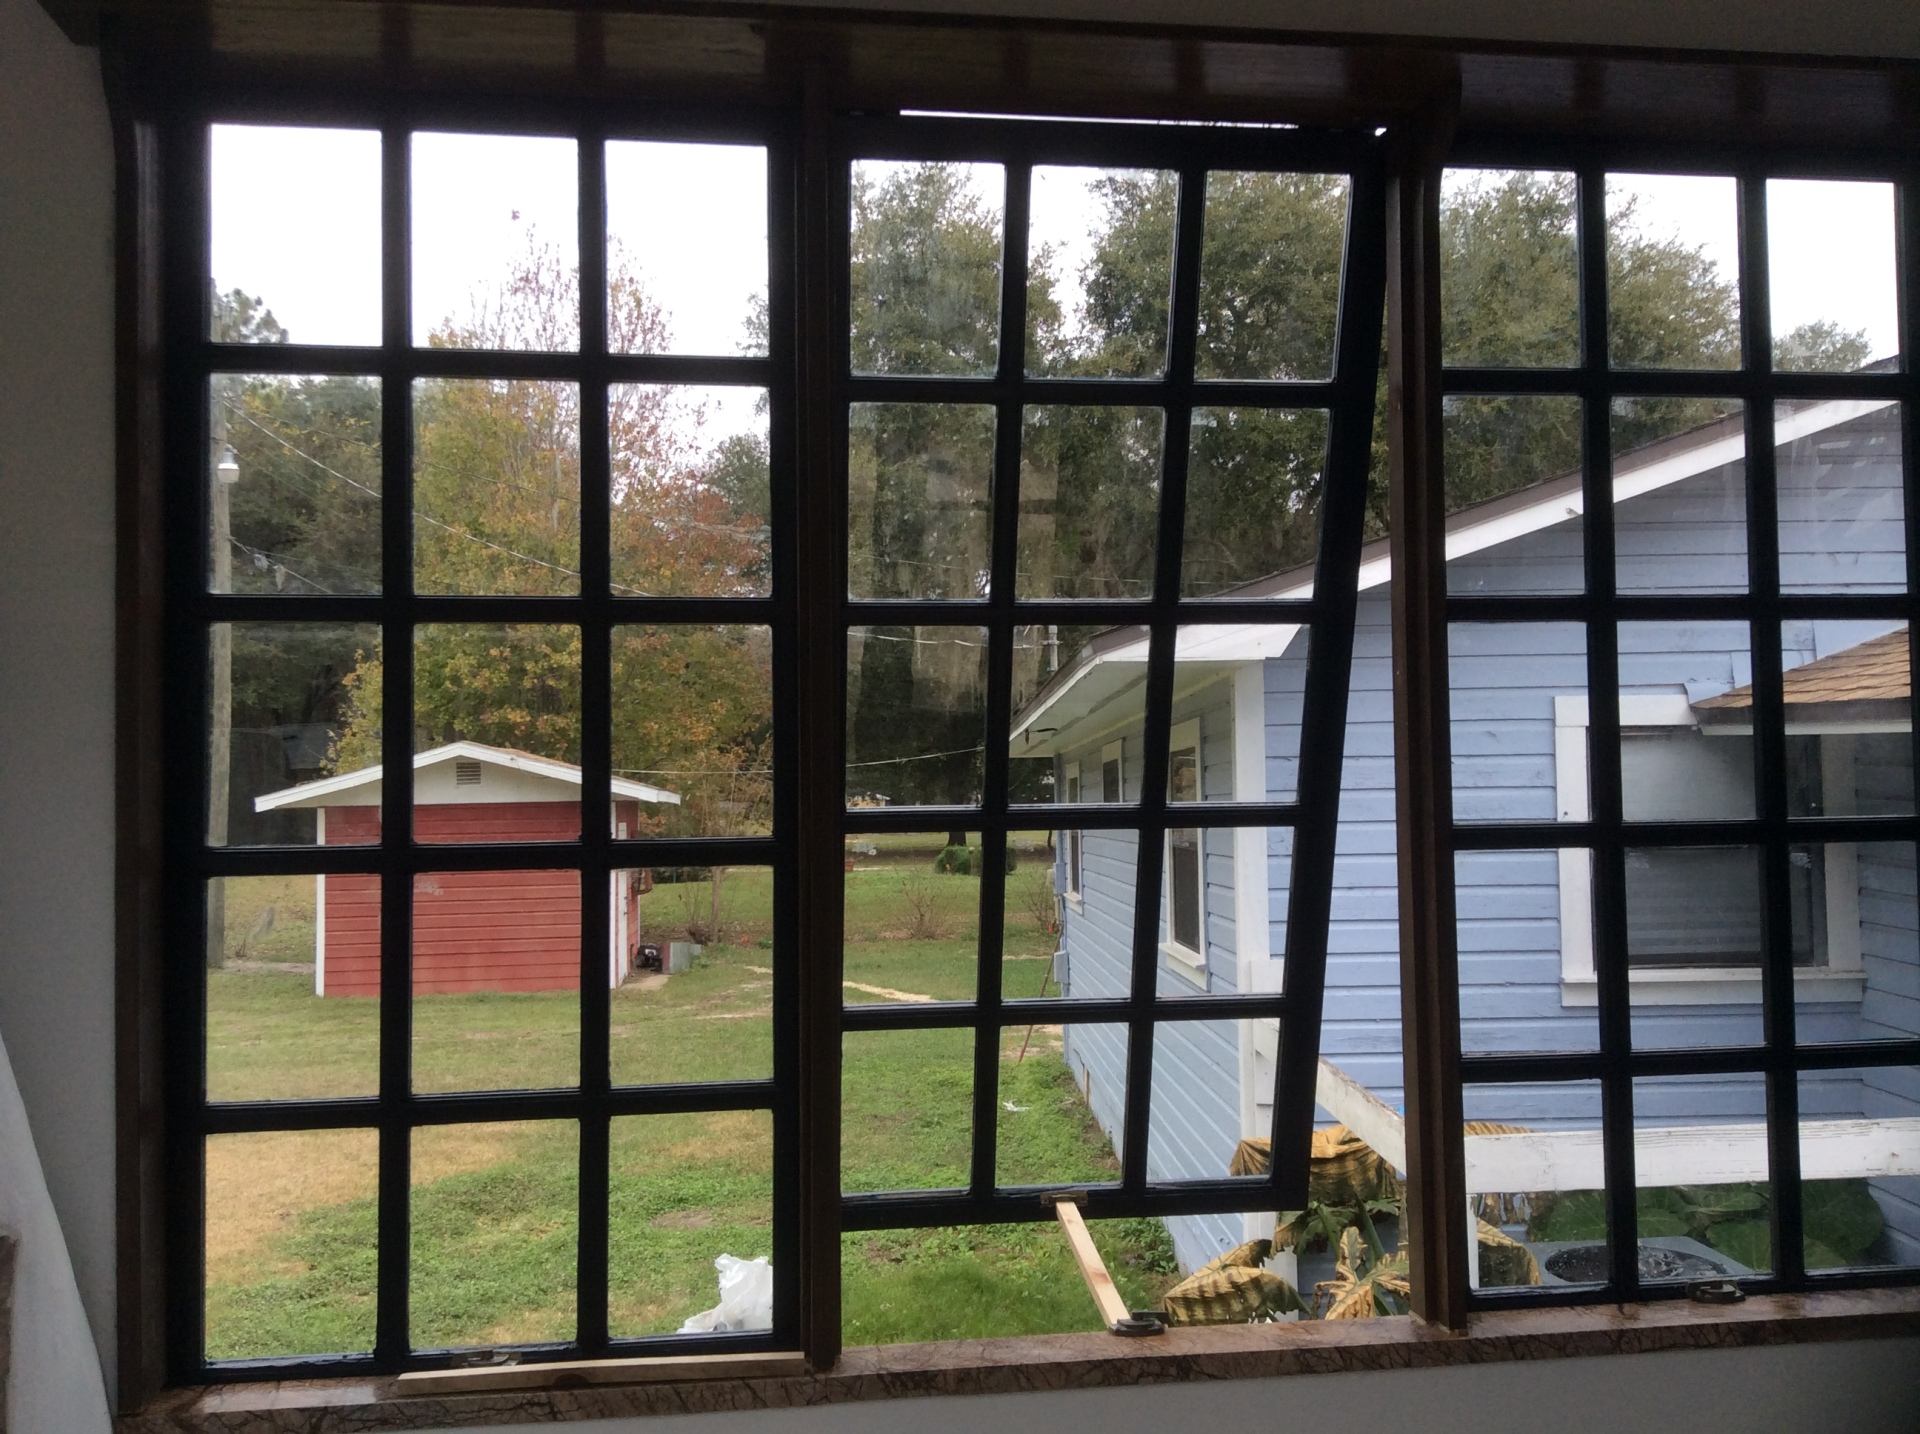 Living space windows